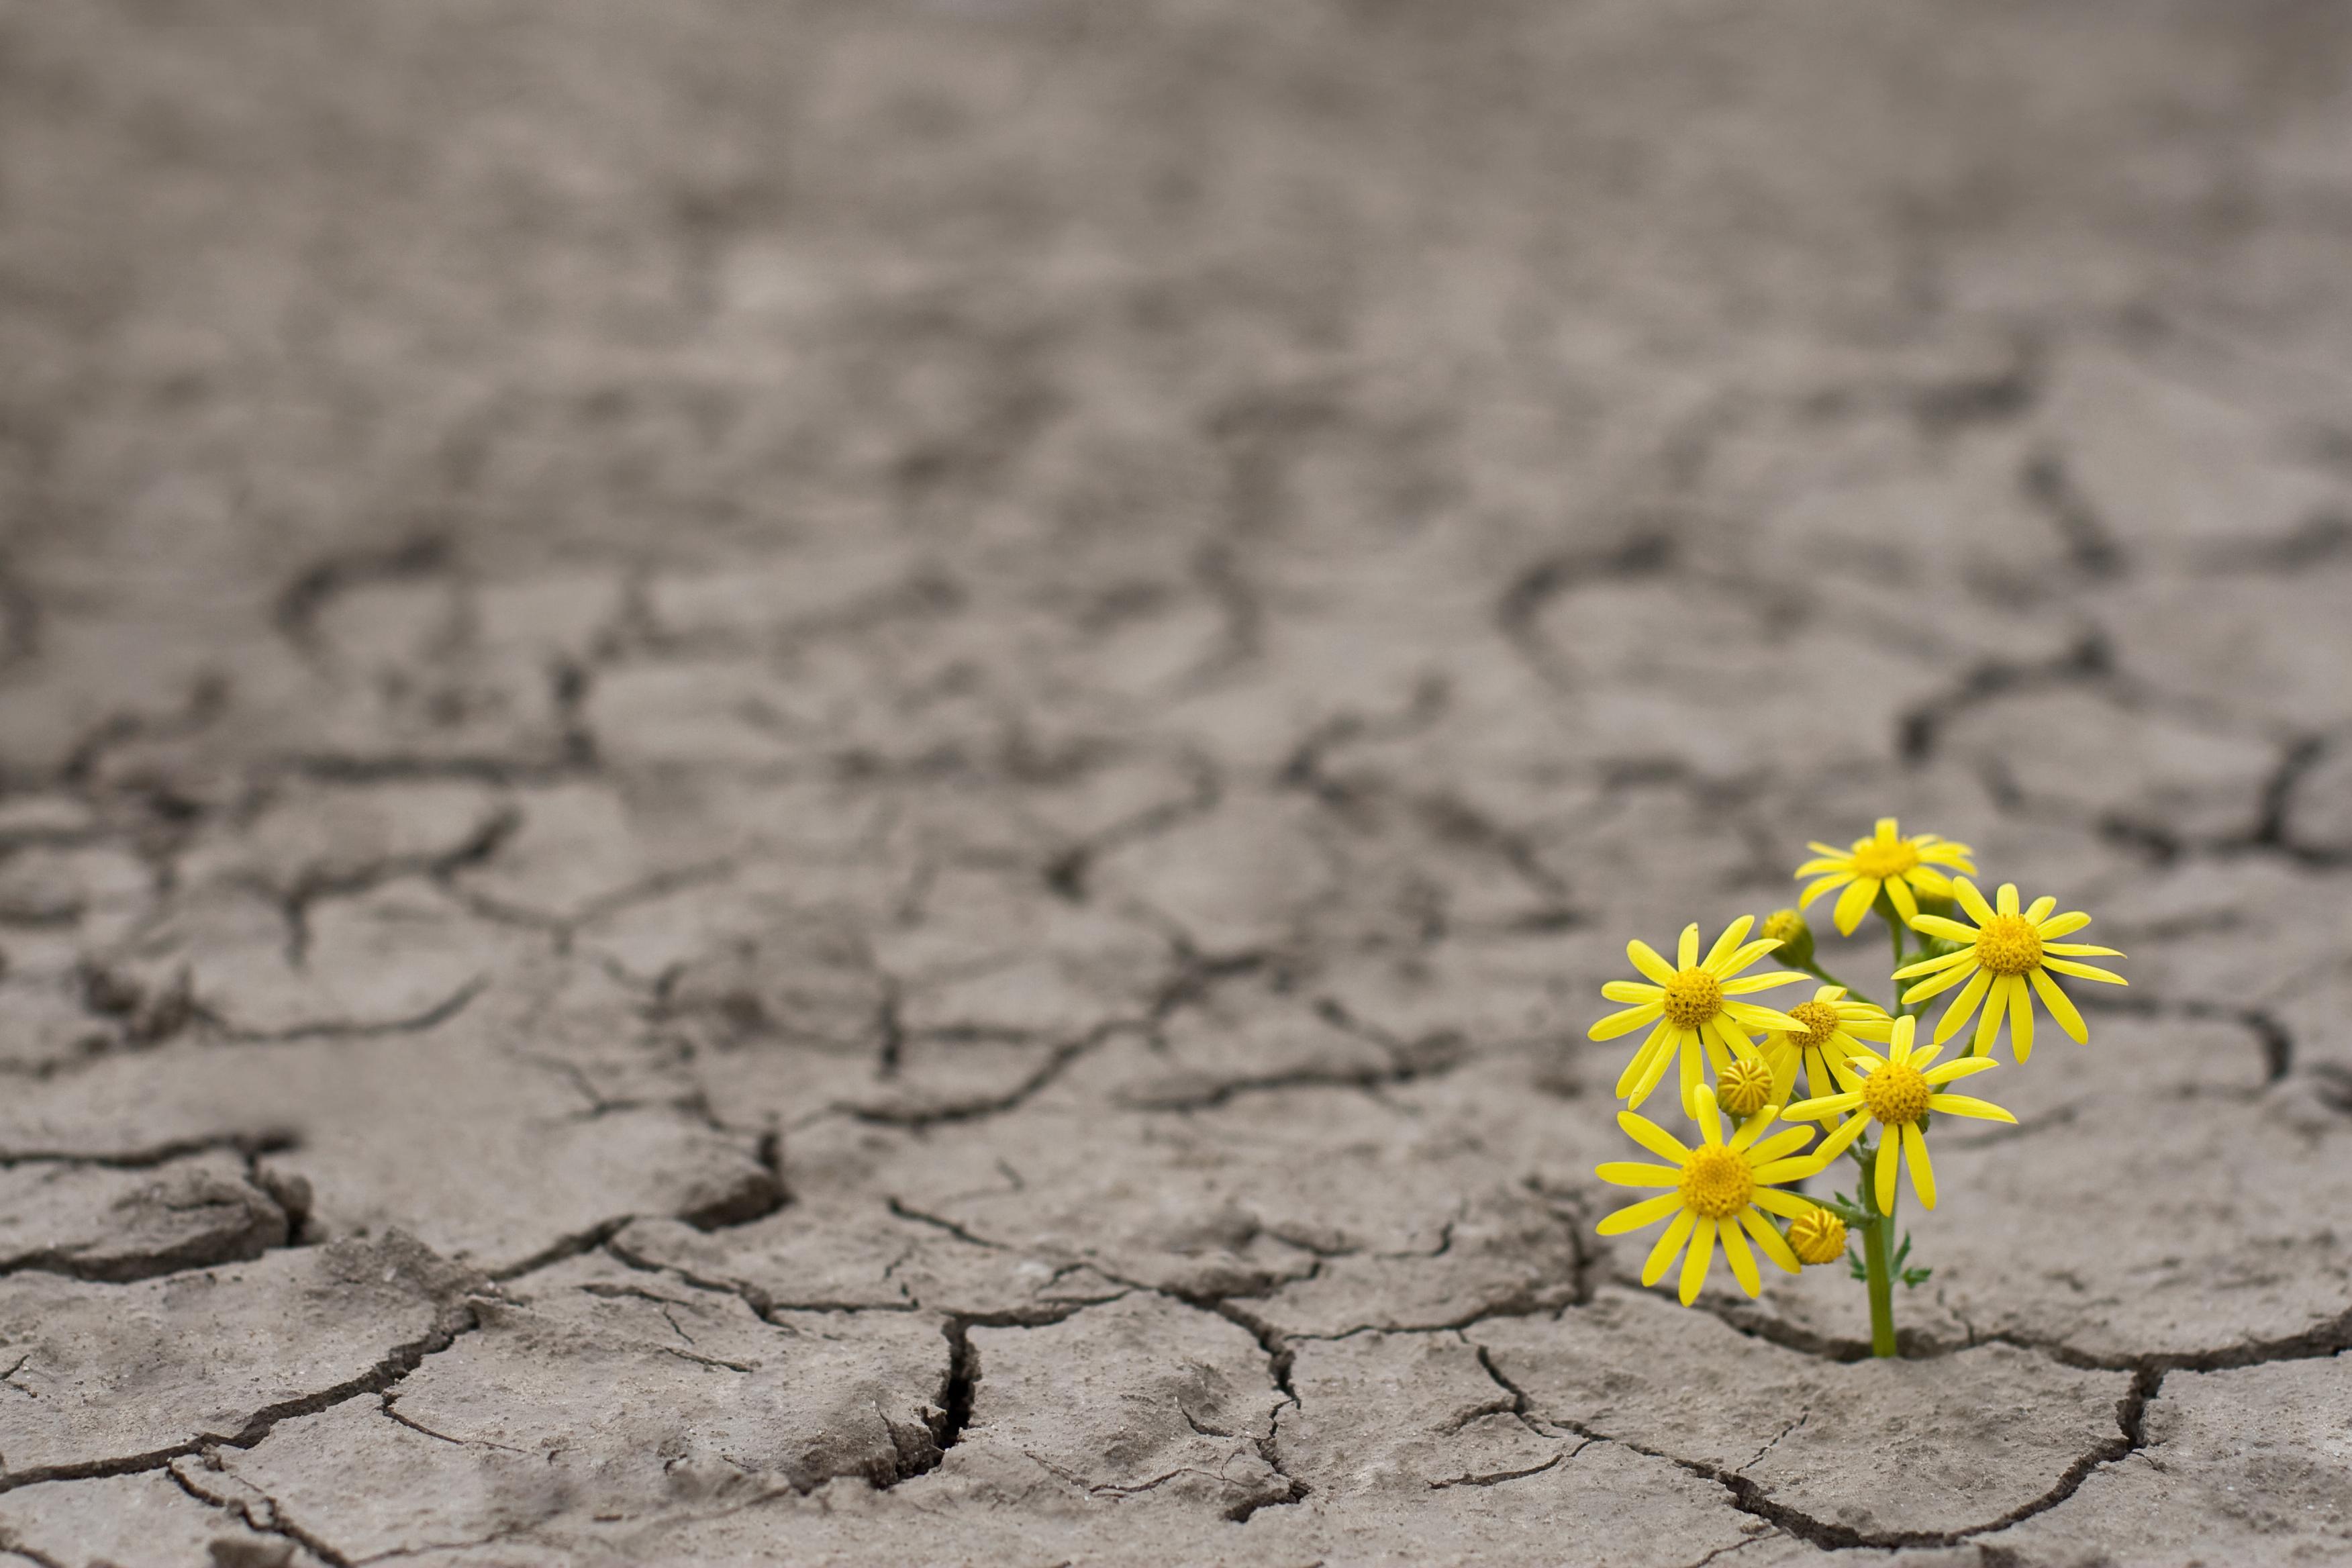 Protesta versus resiliencia